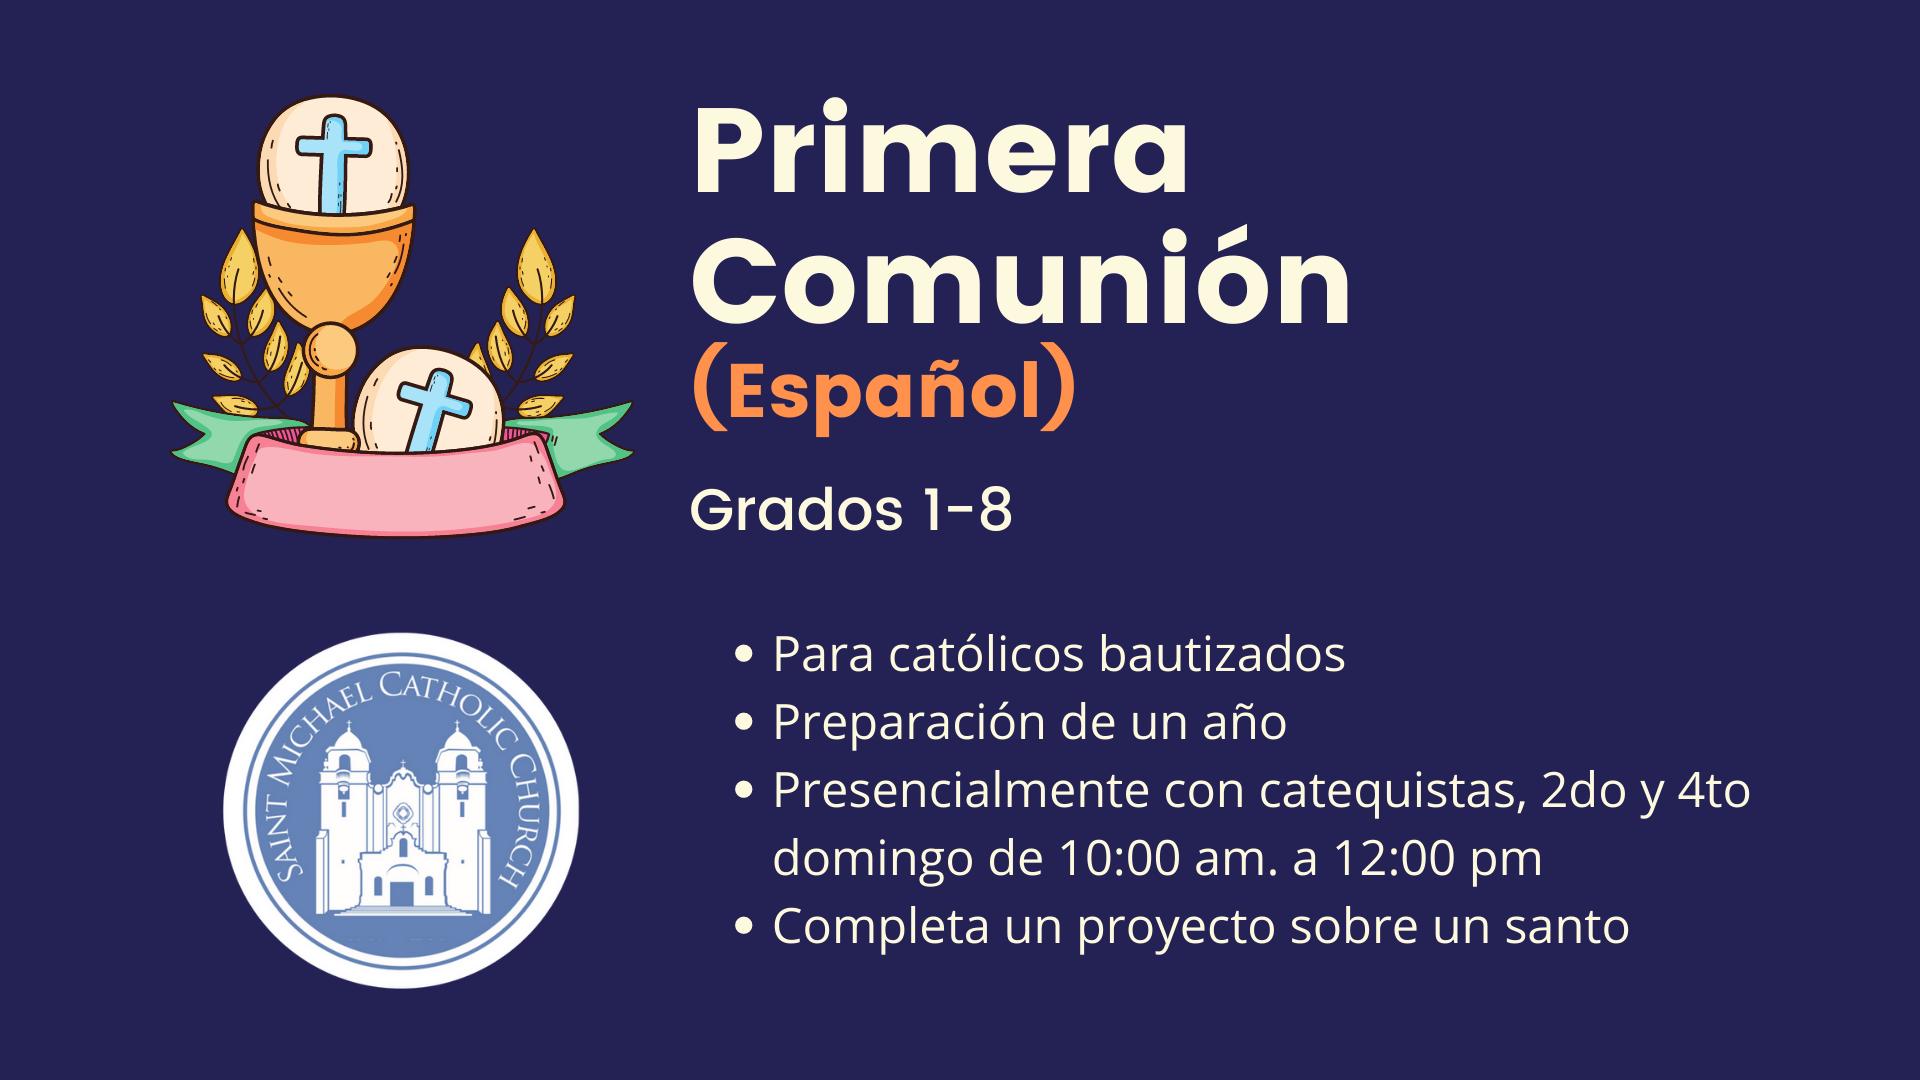 First Communion Espanol 1 8